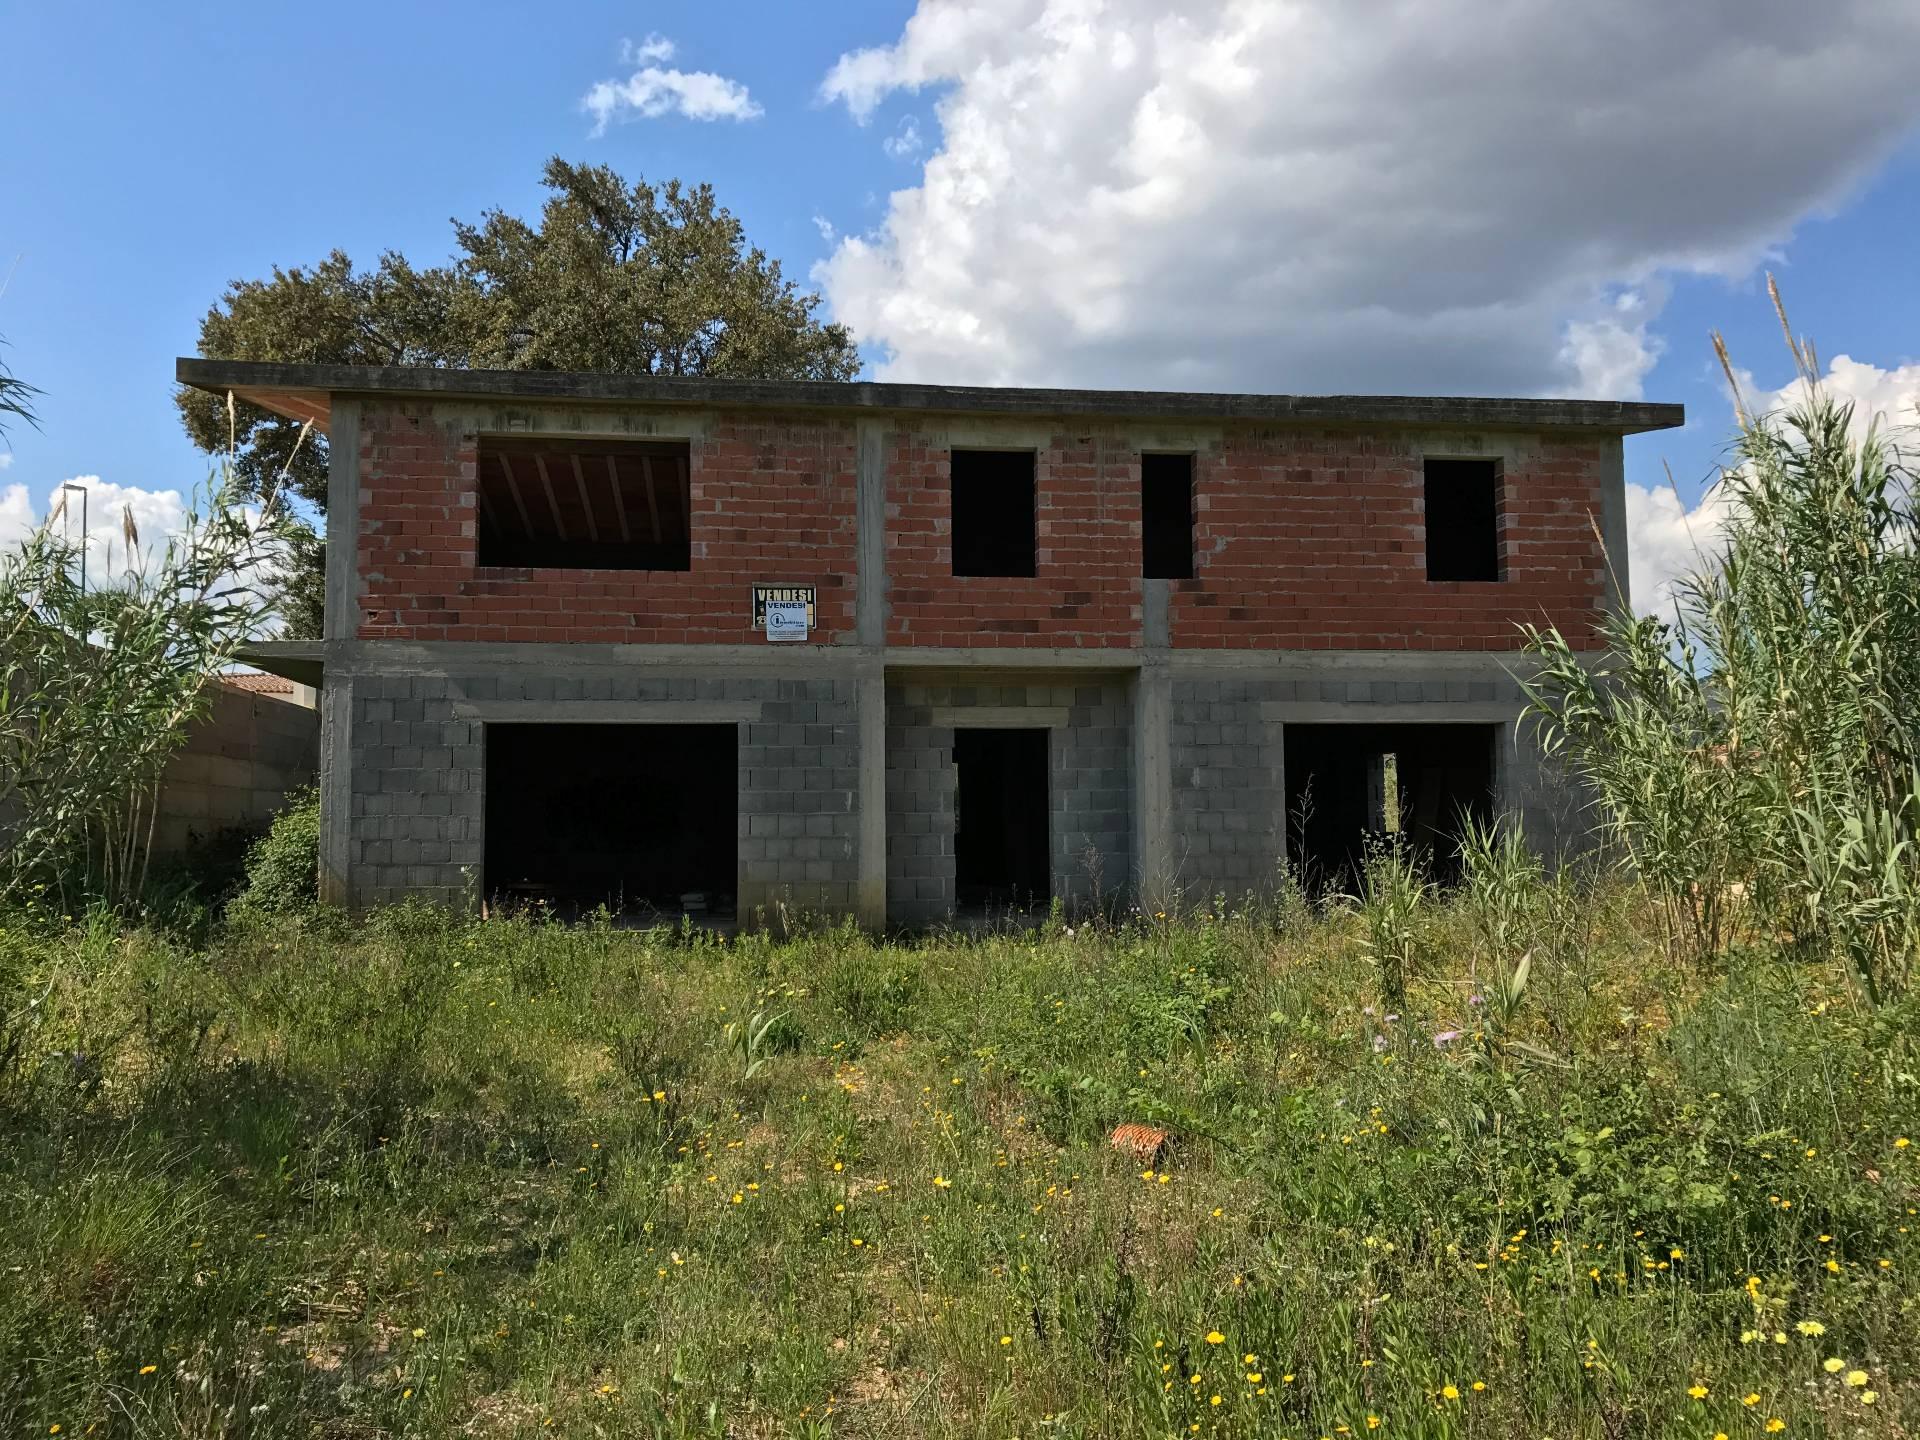 Soluzione Indipendente in vendita a Girasole, 5 locali, Trattative riservate | Cambio Casa.it